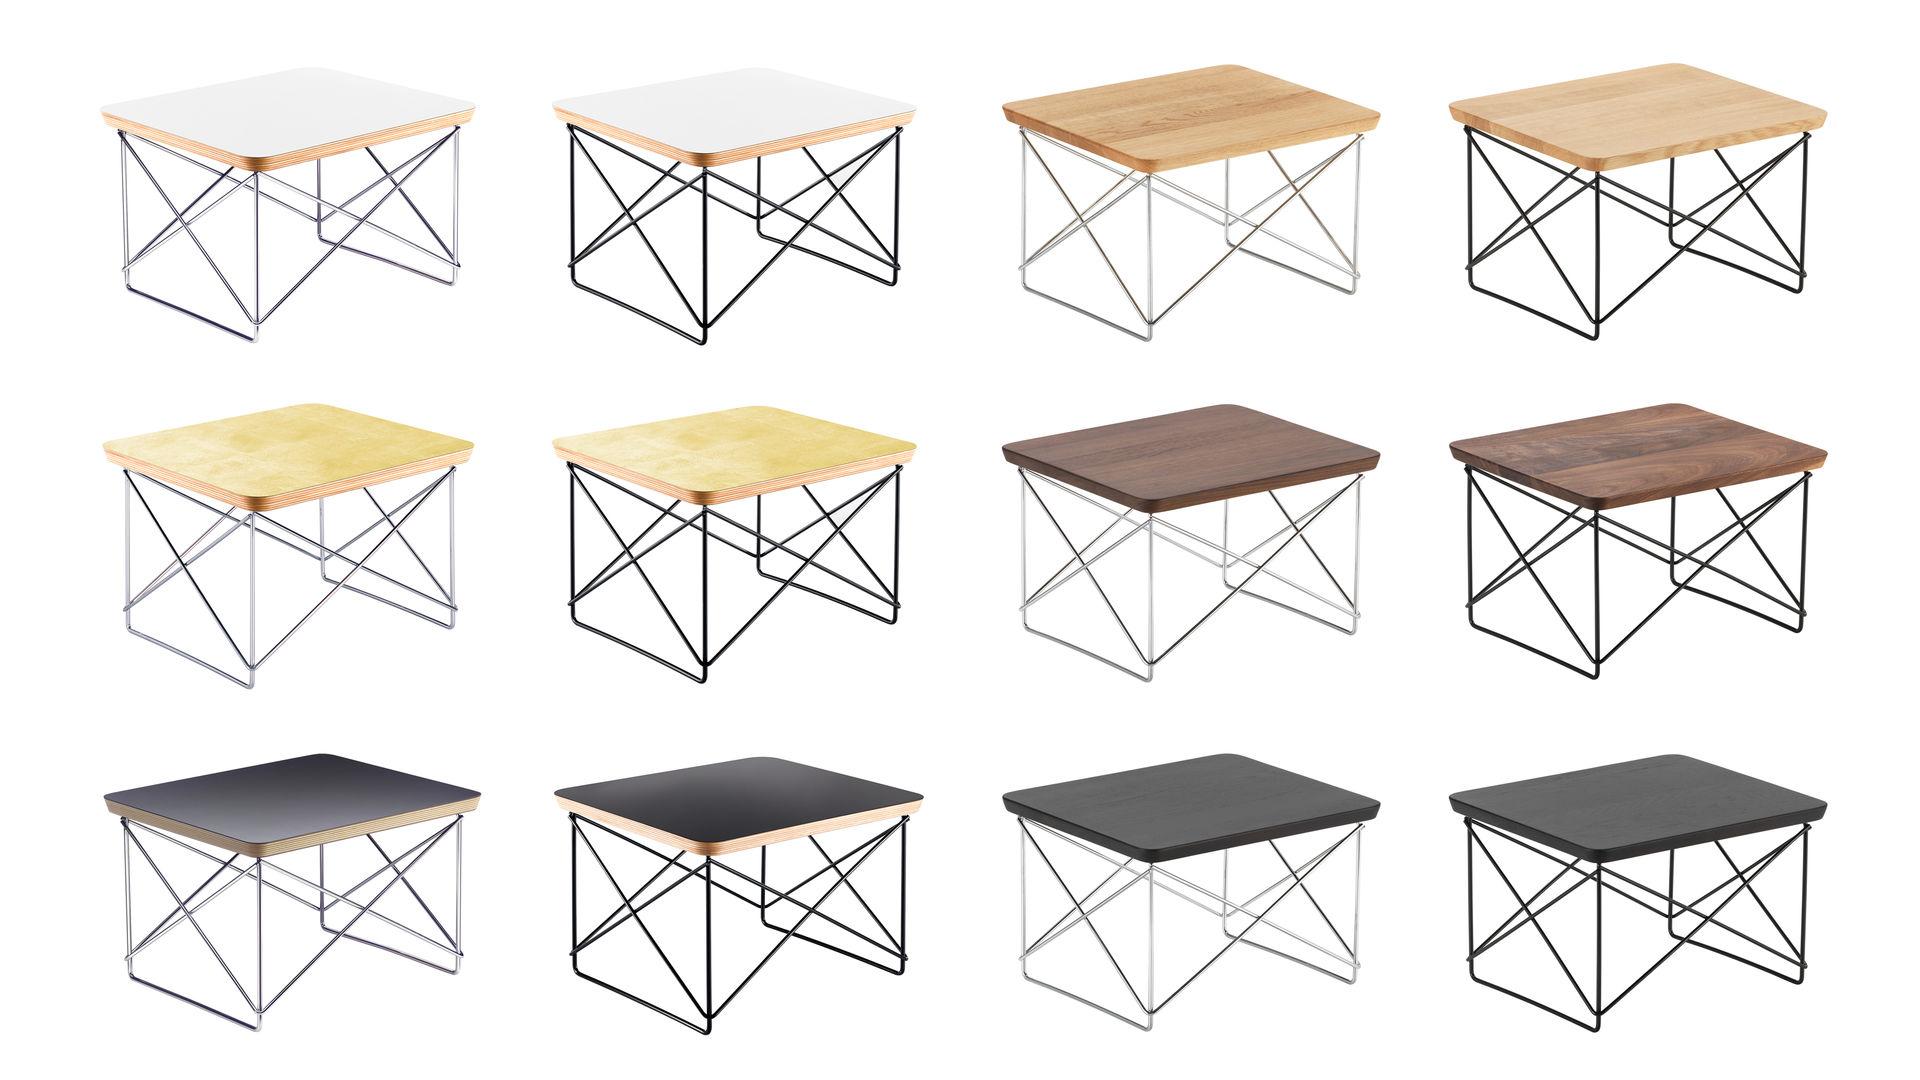 vitra occasional table ltr. Black Bedroom Furniture Sets. Home Design Ideas